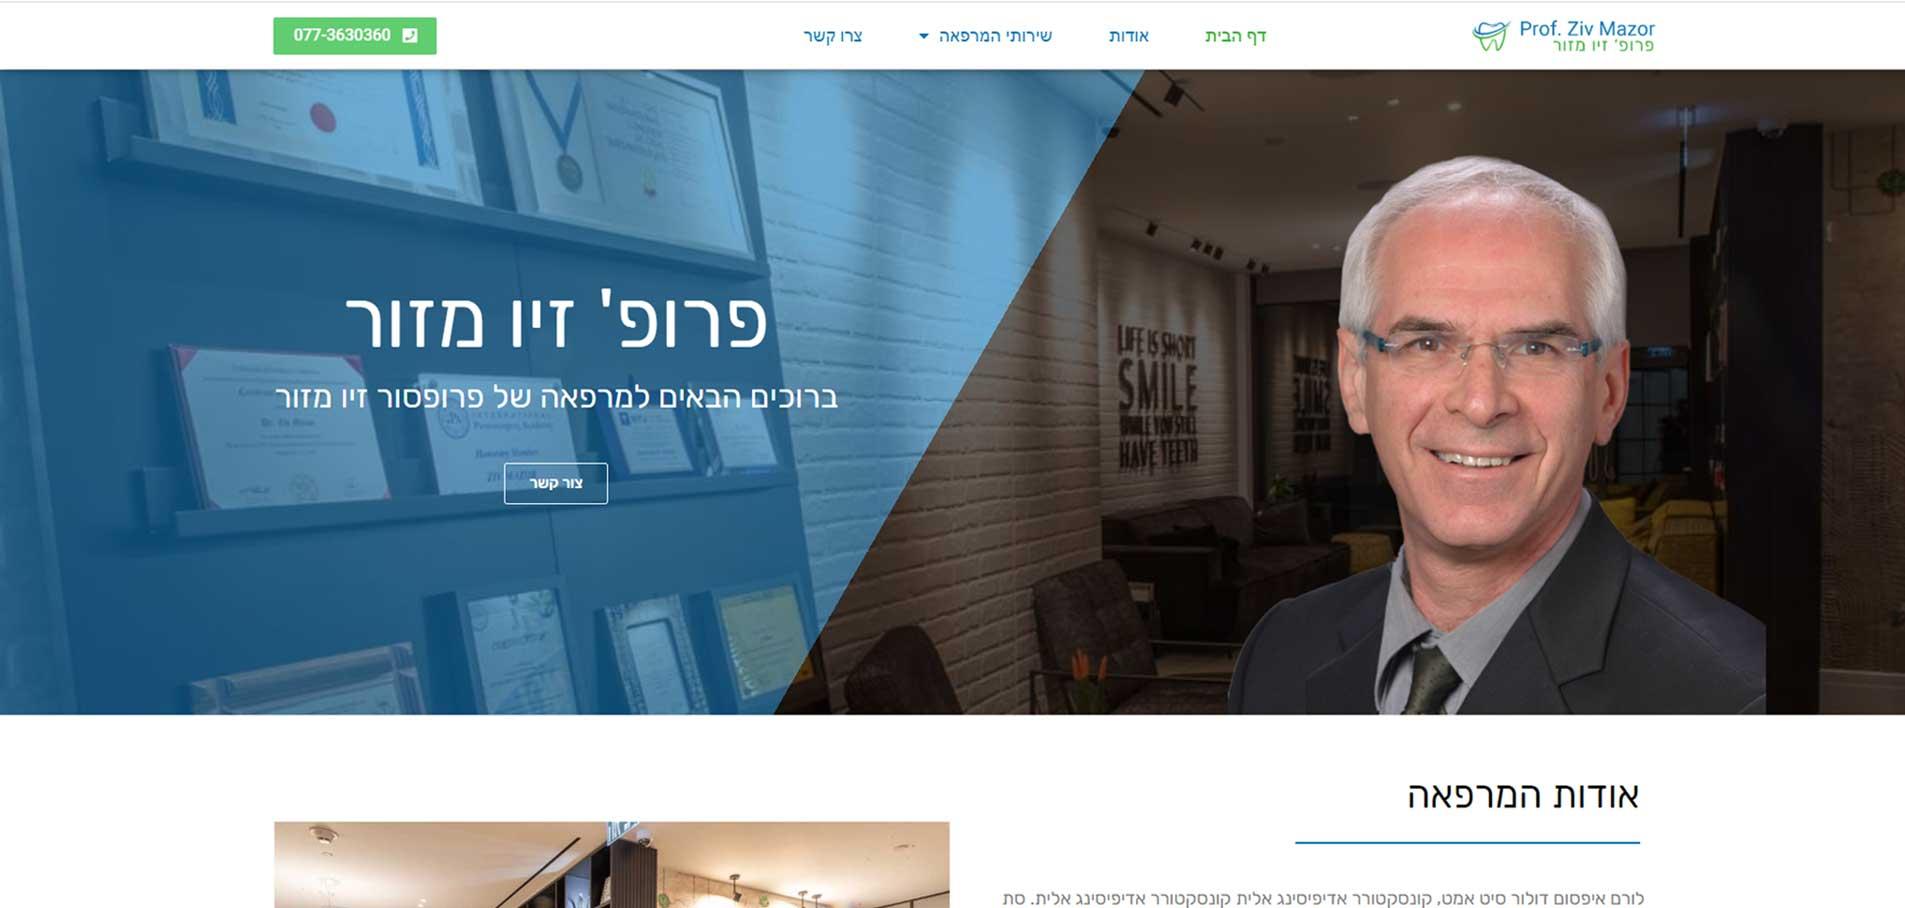 Ziv Mazor website B